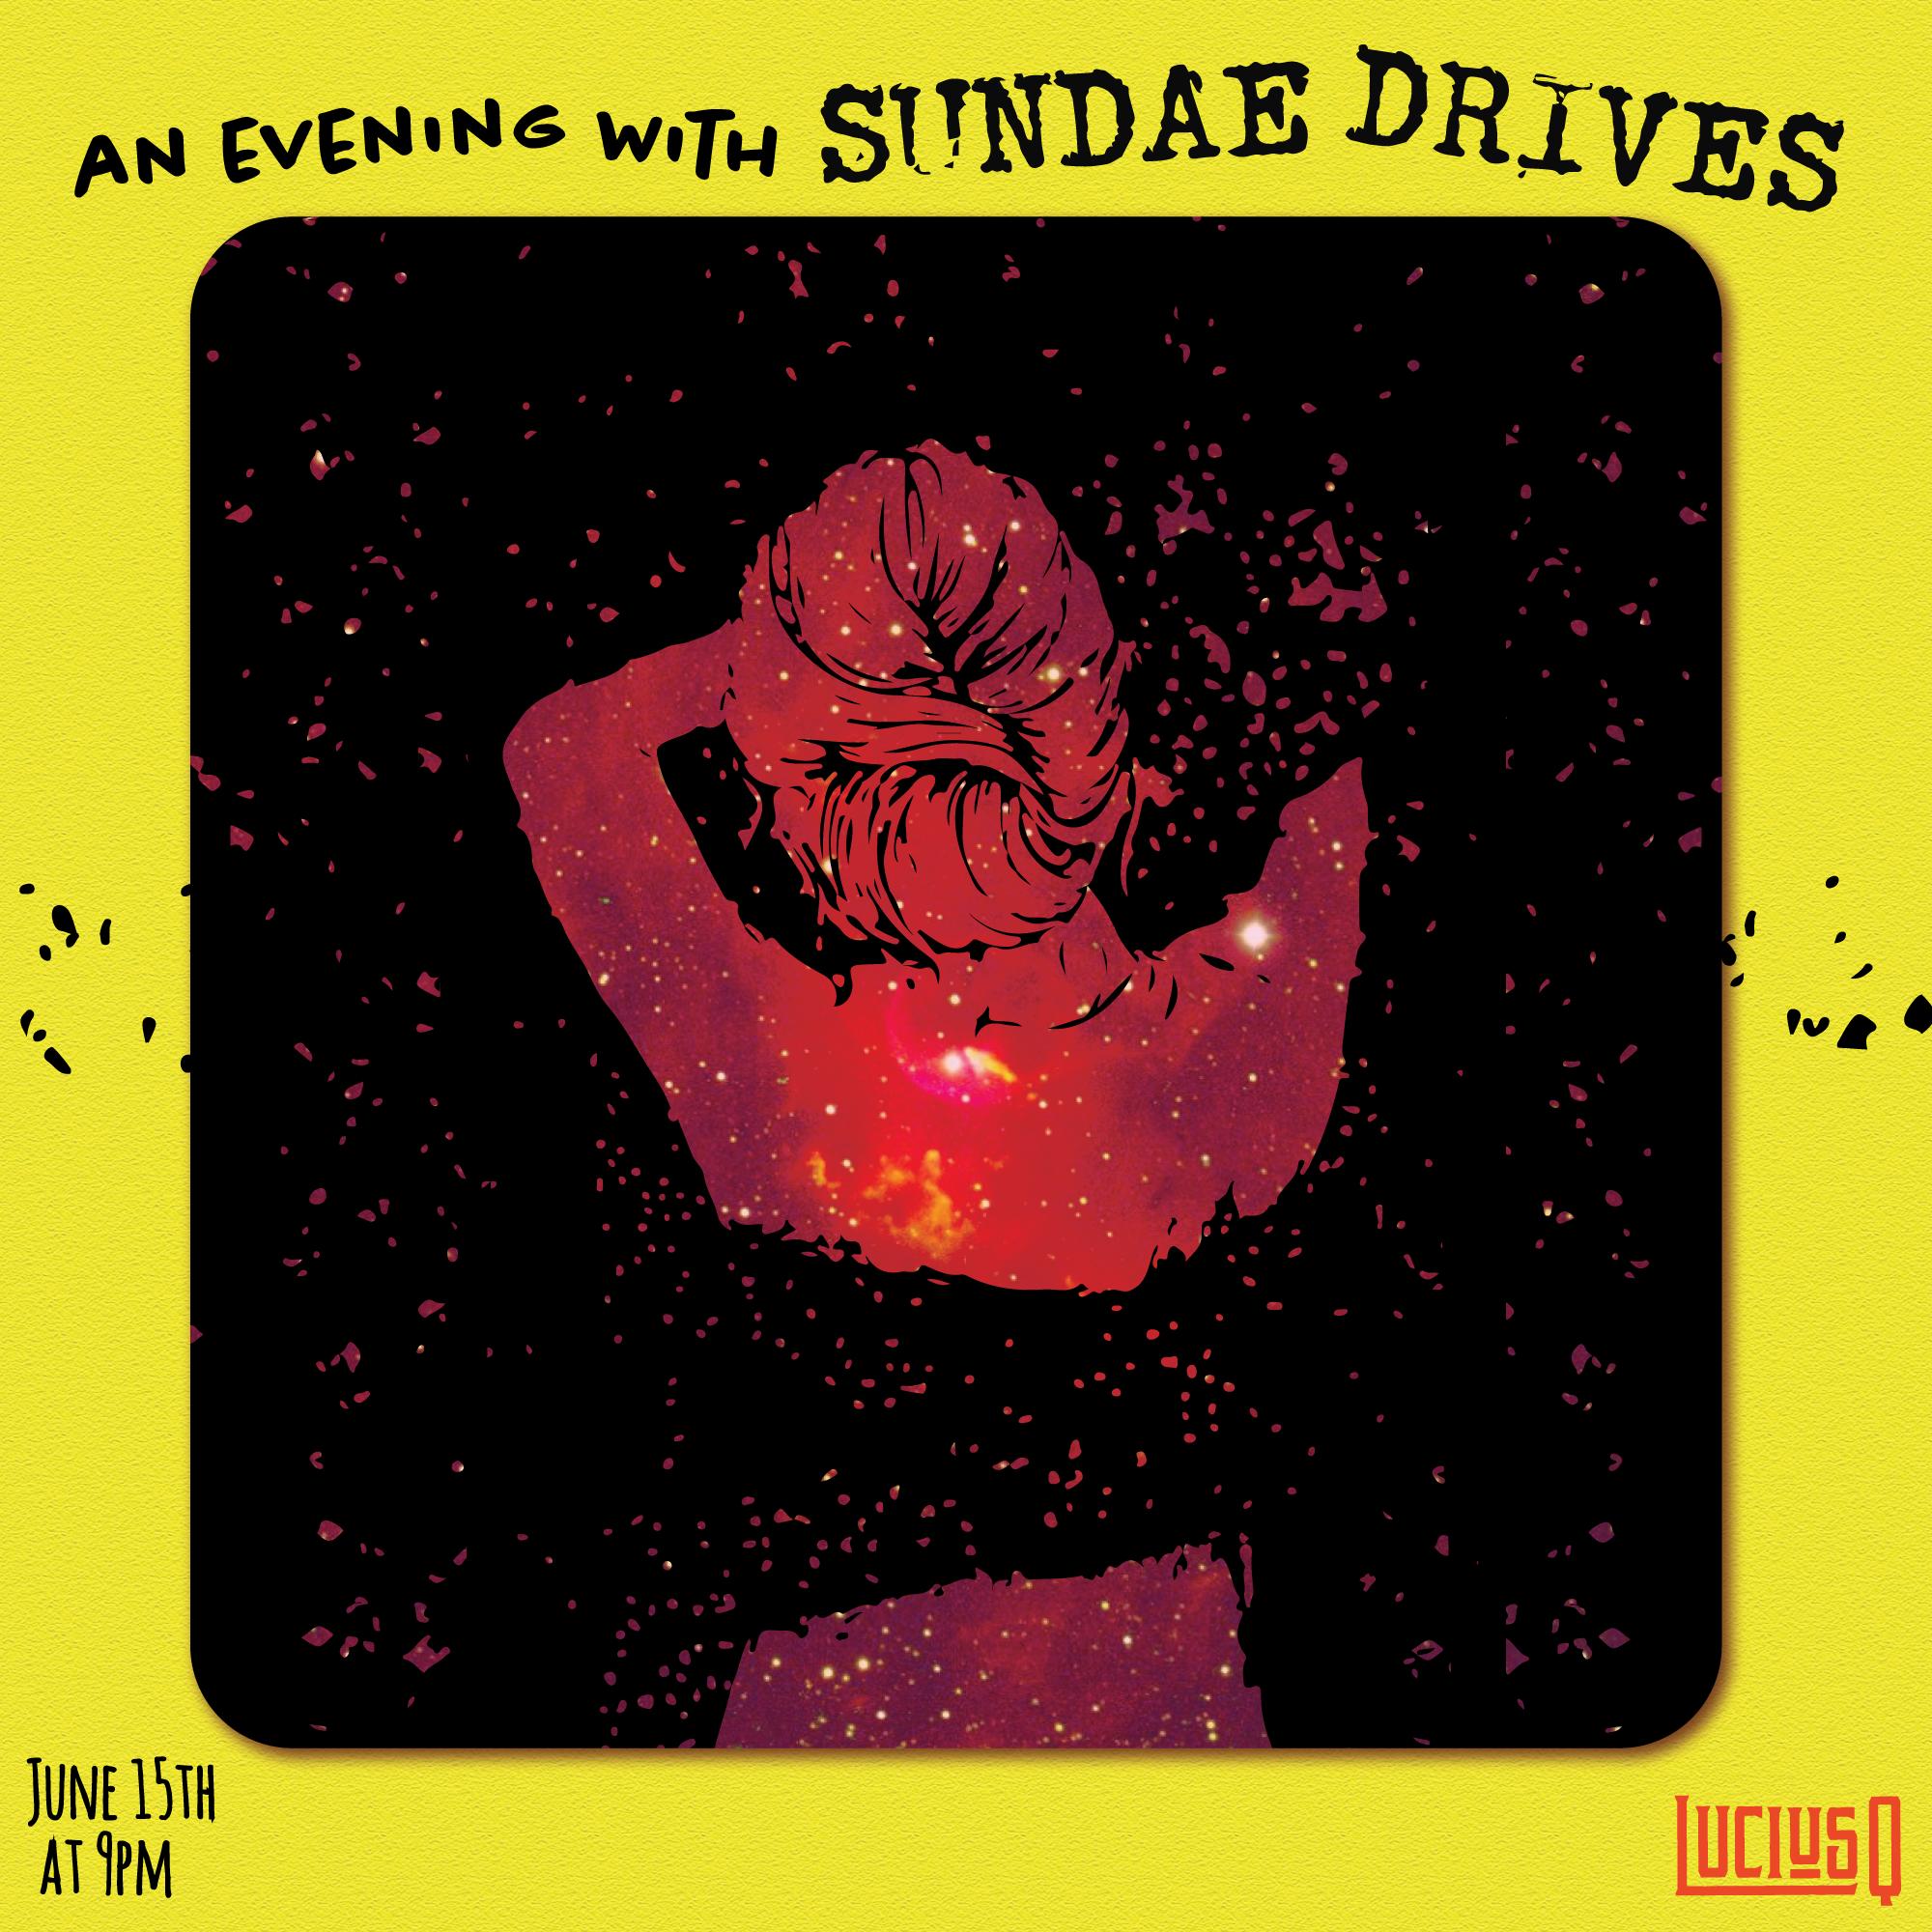 FiR-Creative---LuciusQ---Sundae-Drives-Final.png